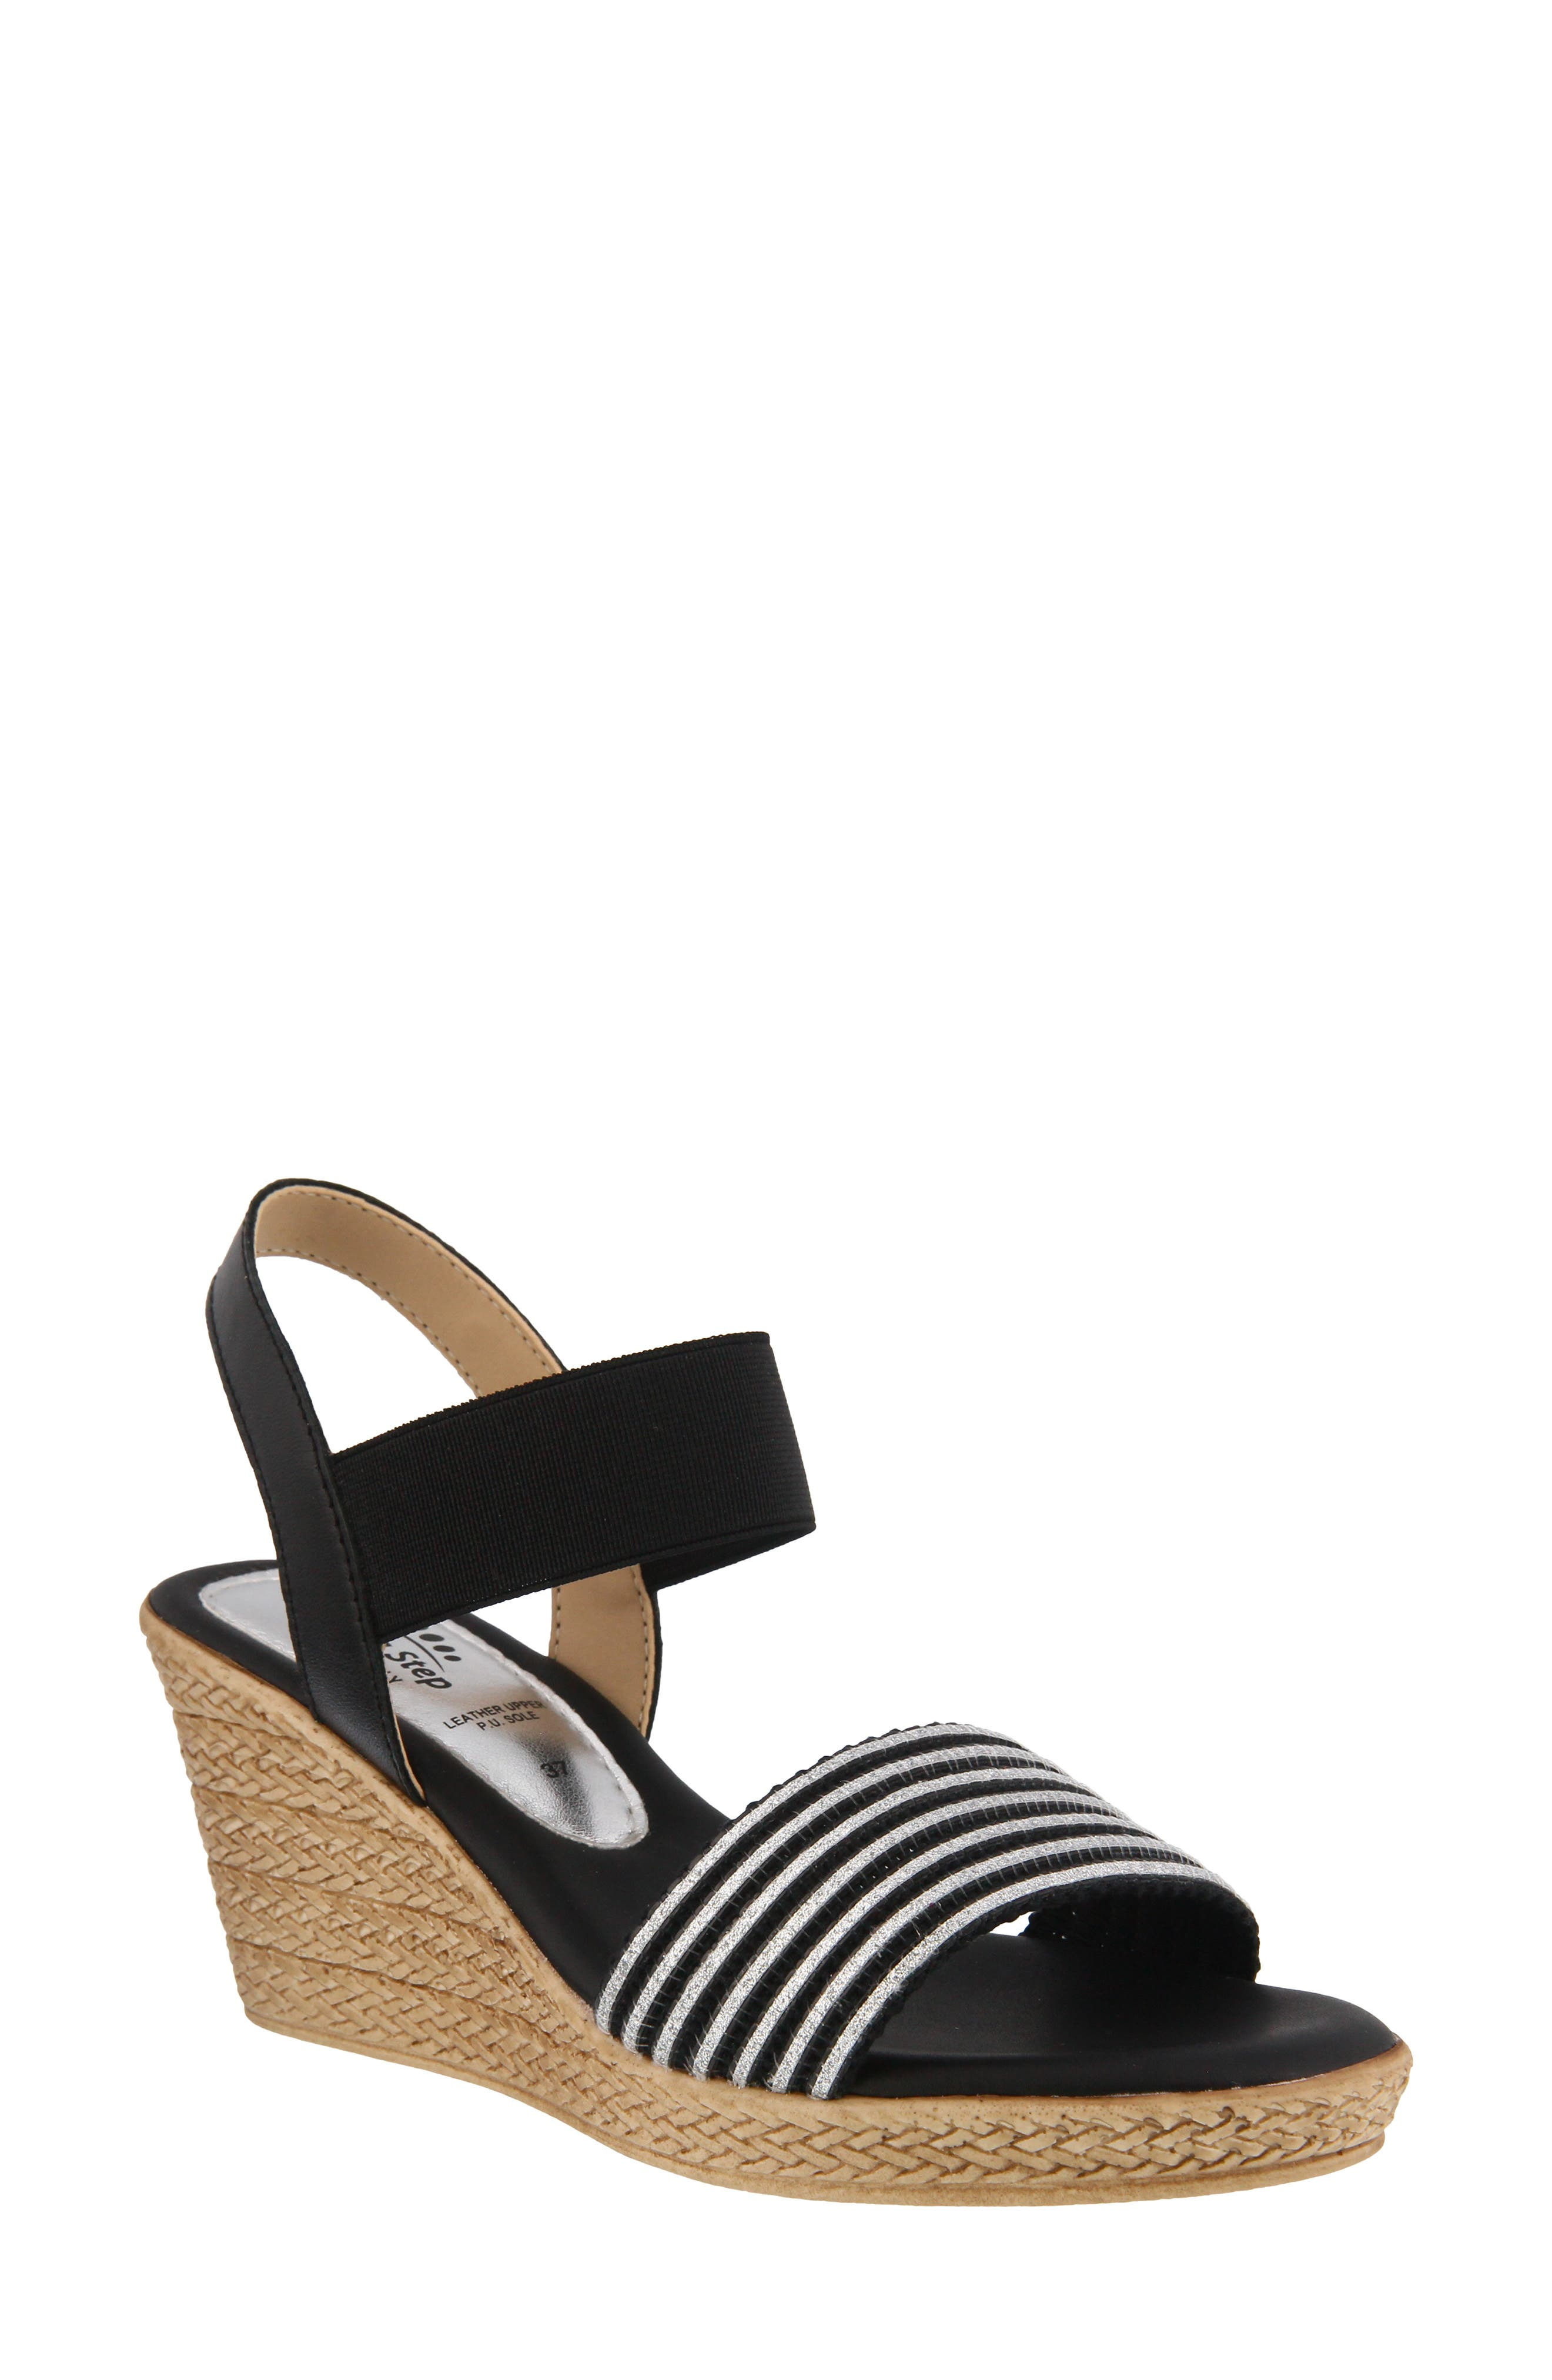 Rahma Wedge Sandal, Main, color, BLACK LEATHER